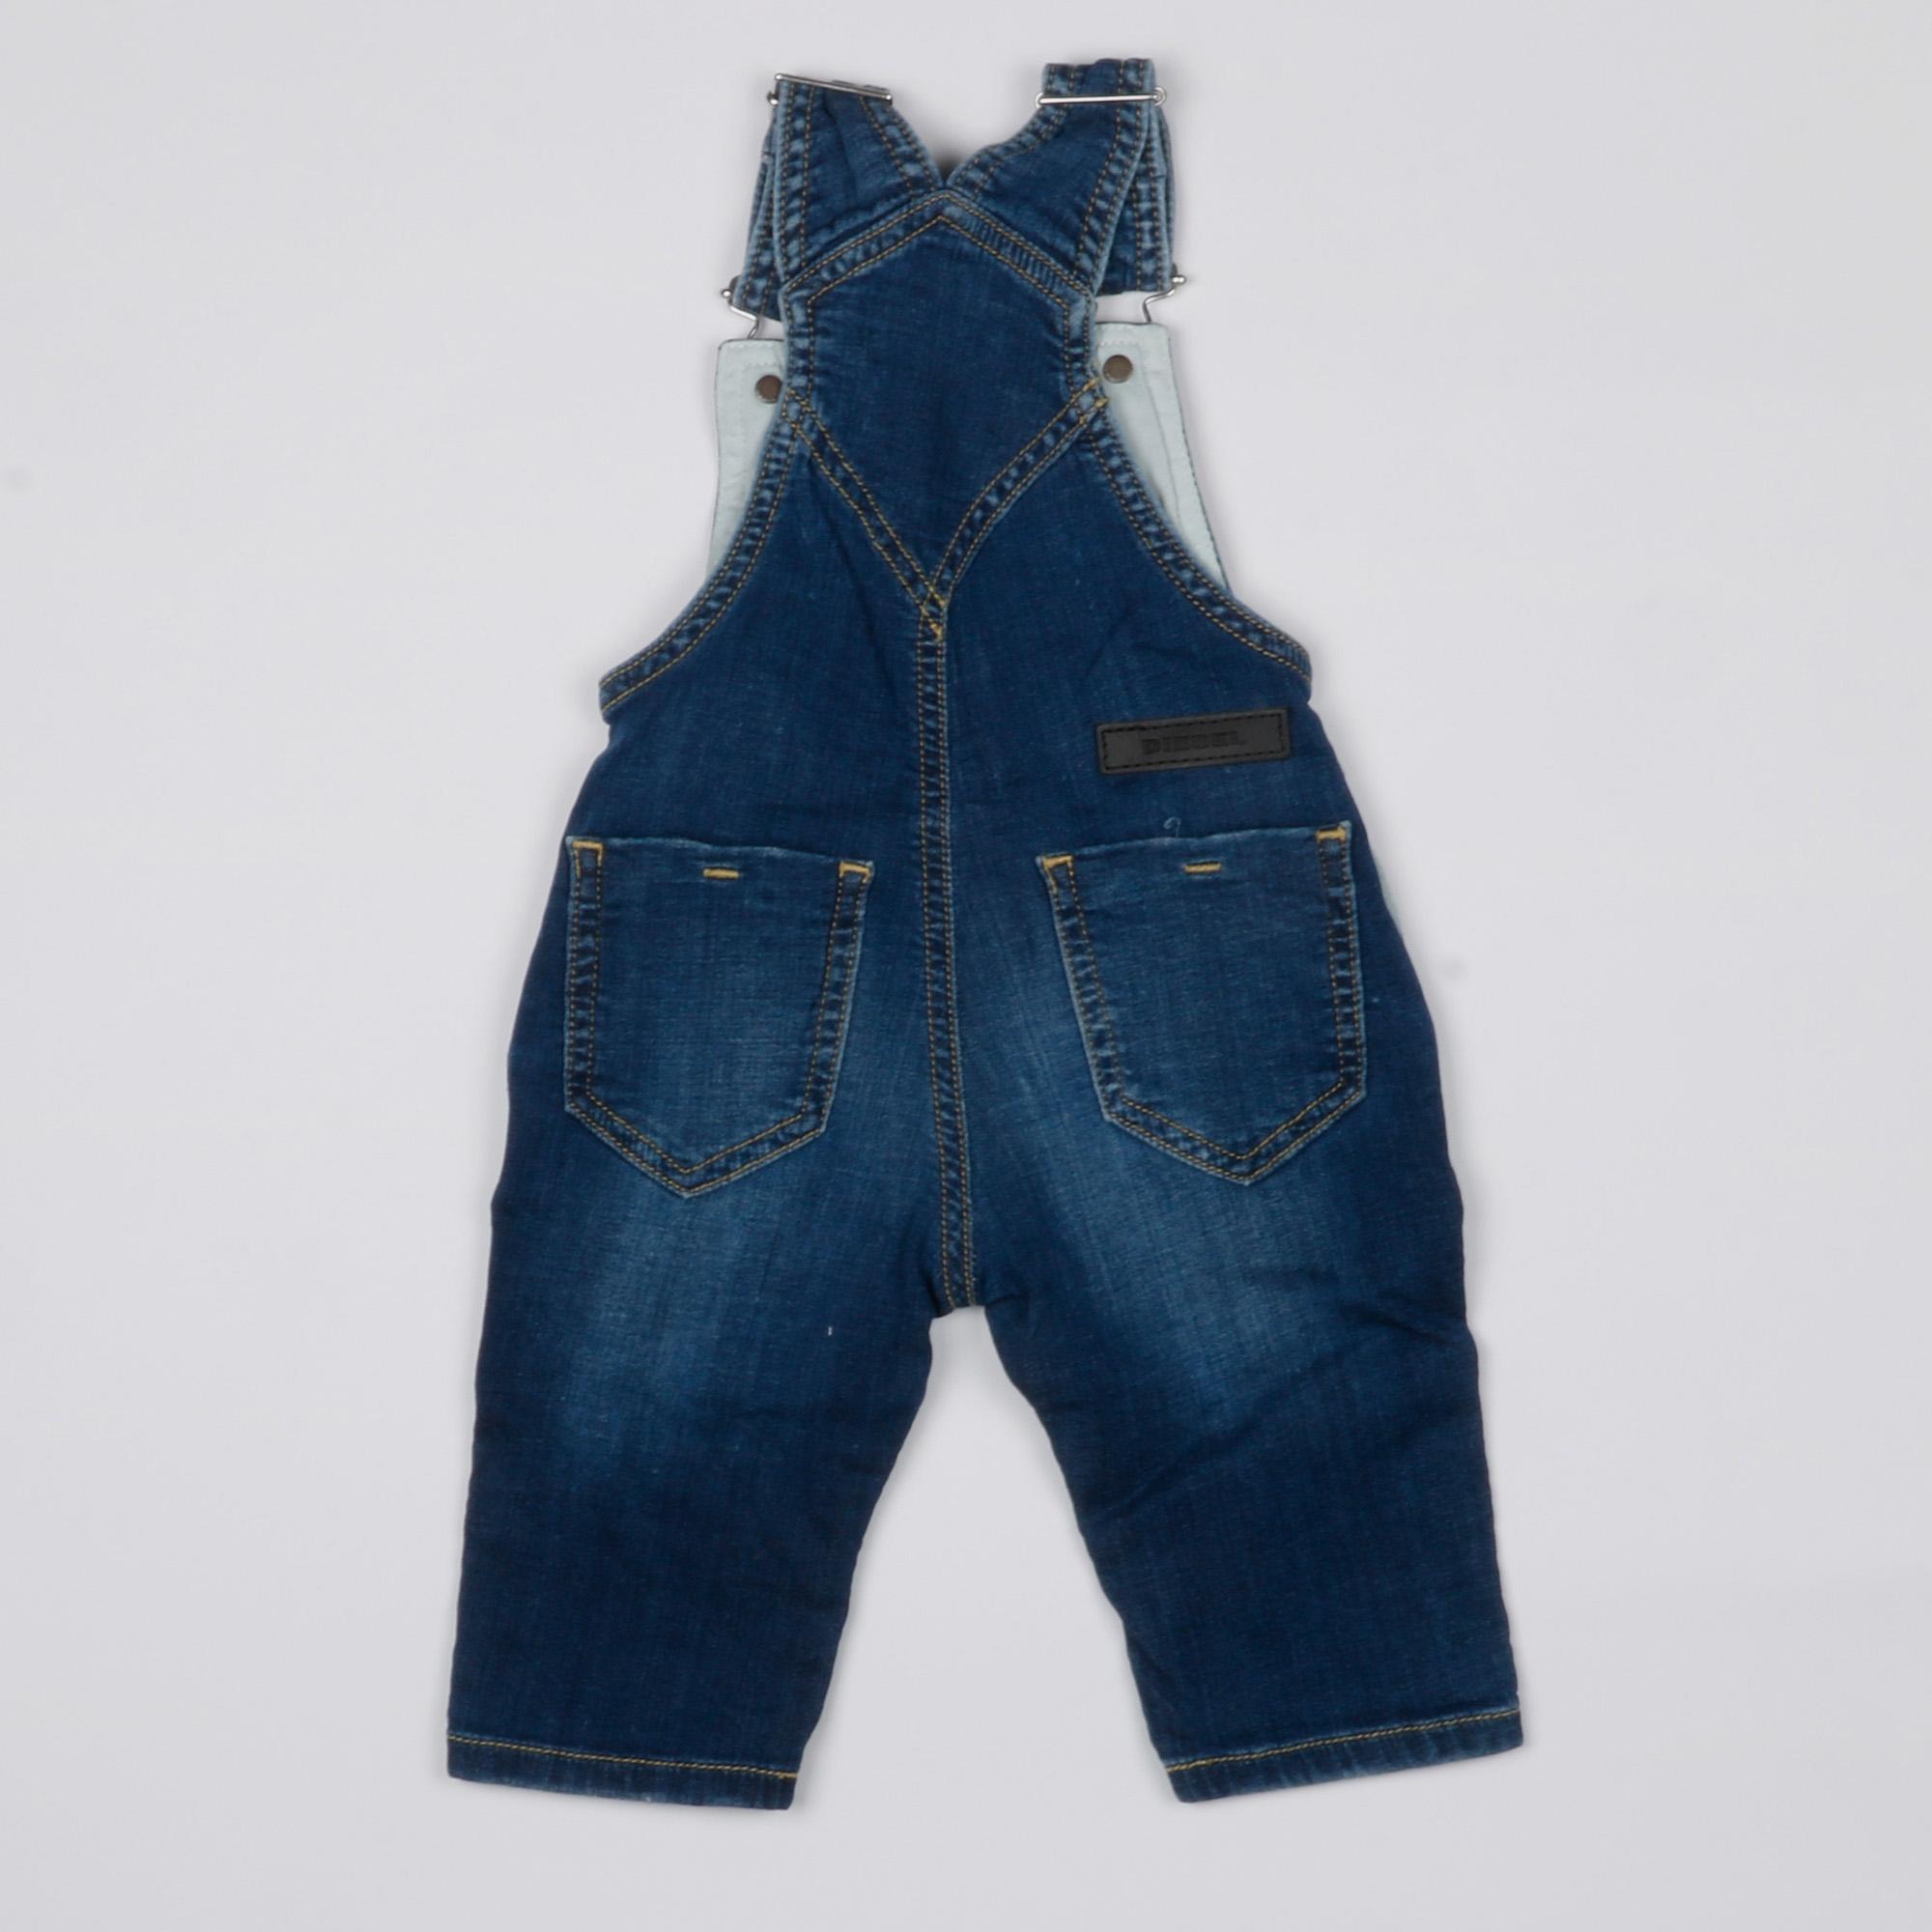 Salopette in Jogg Jeans - Denim